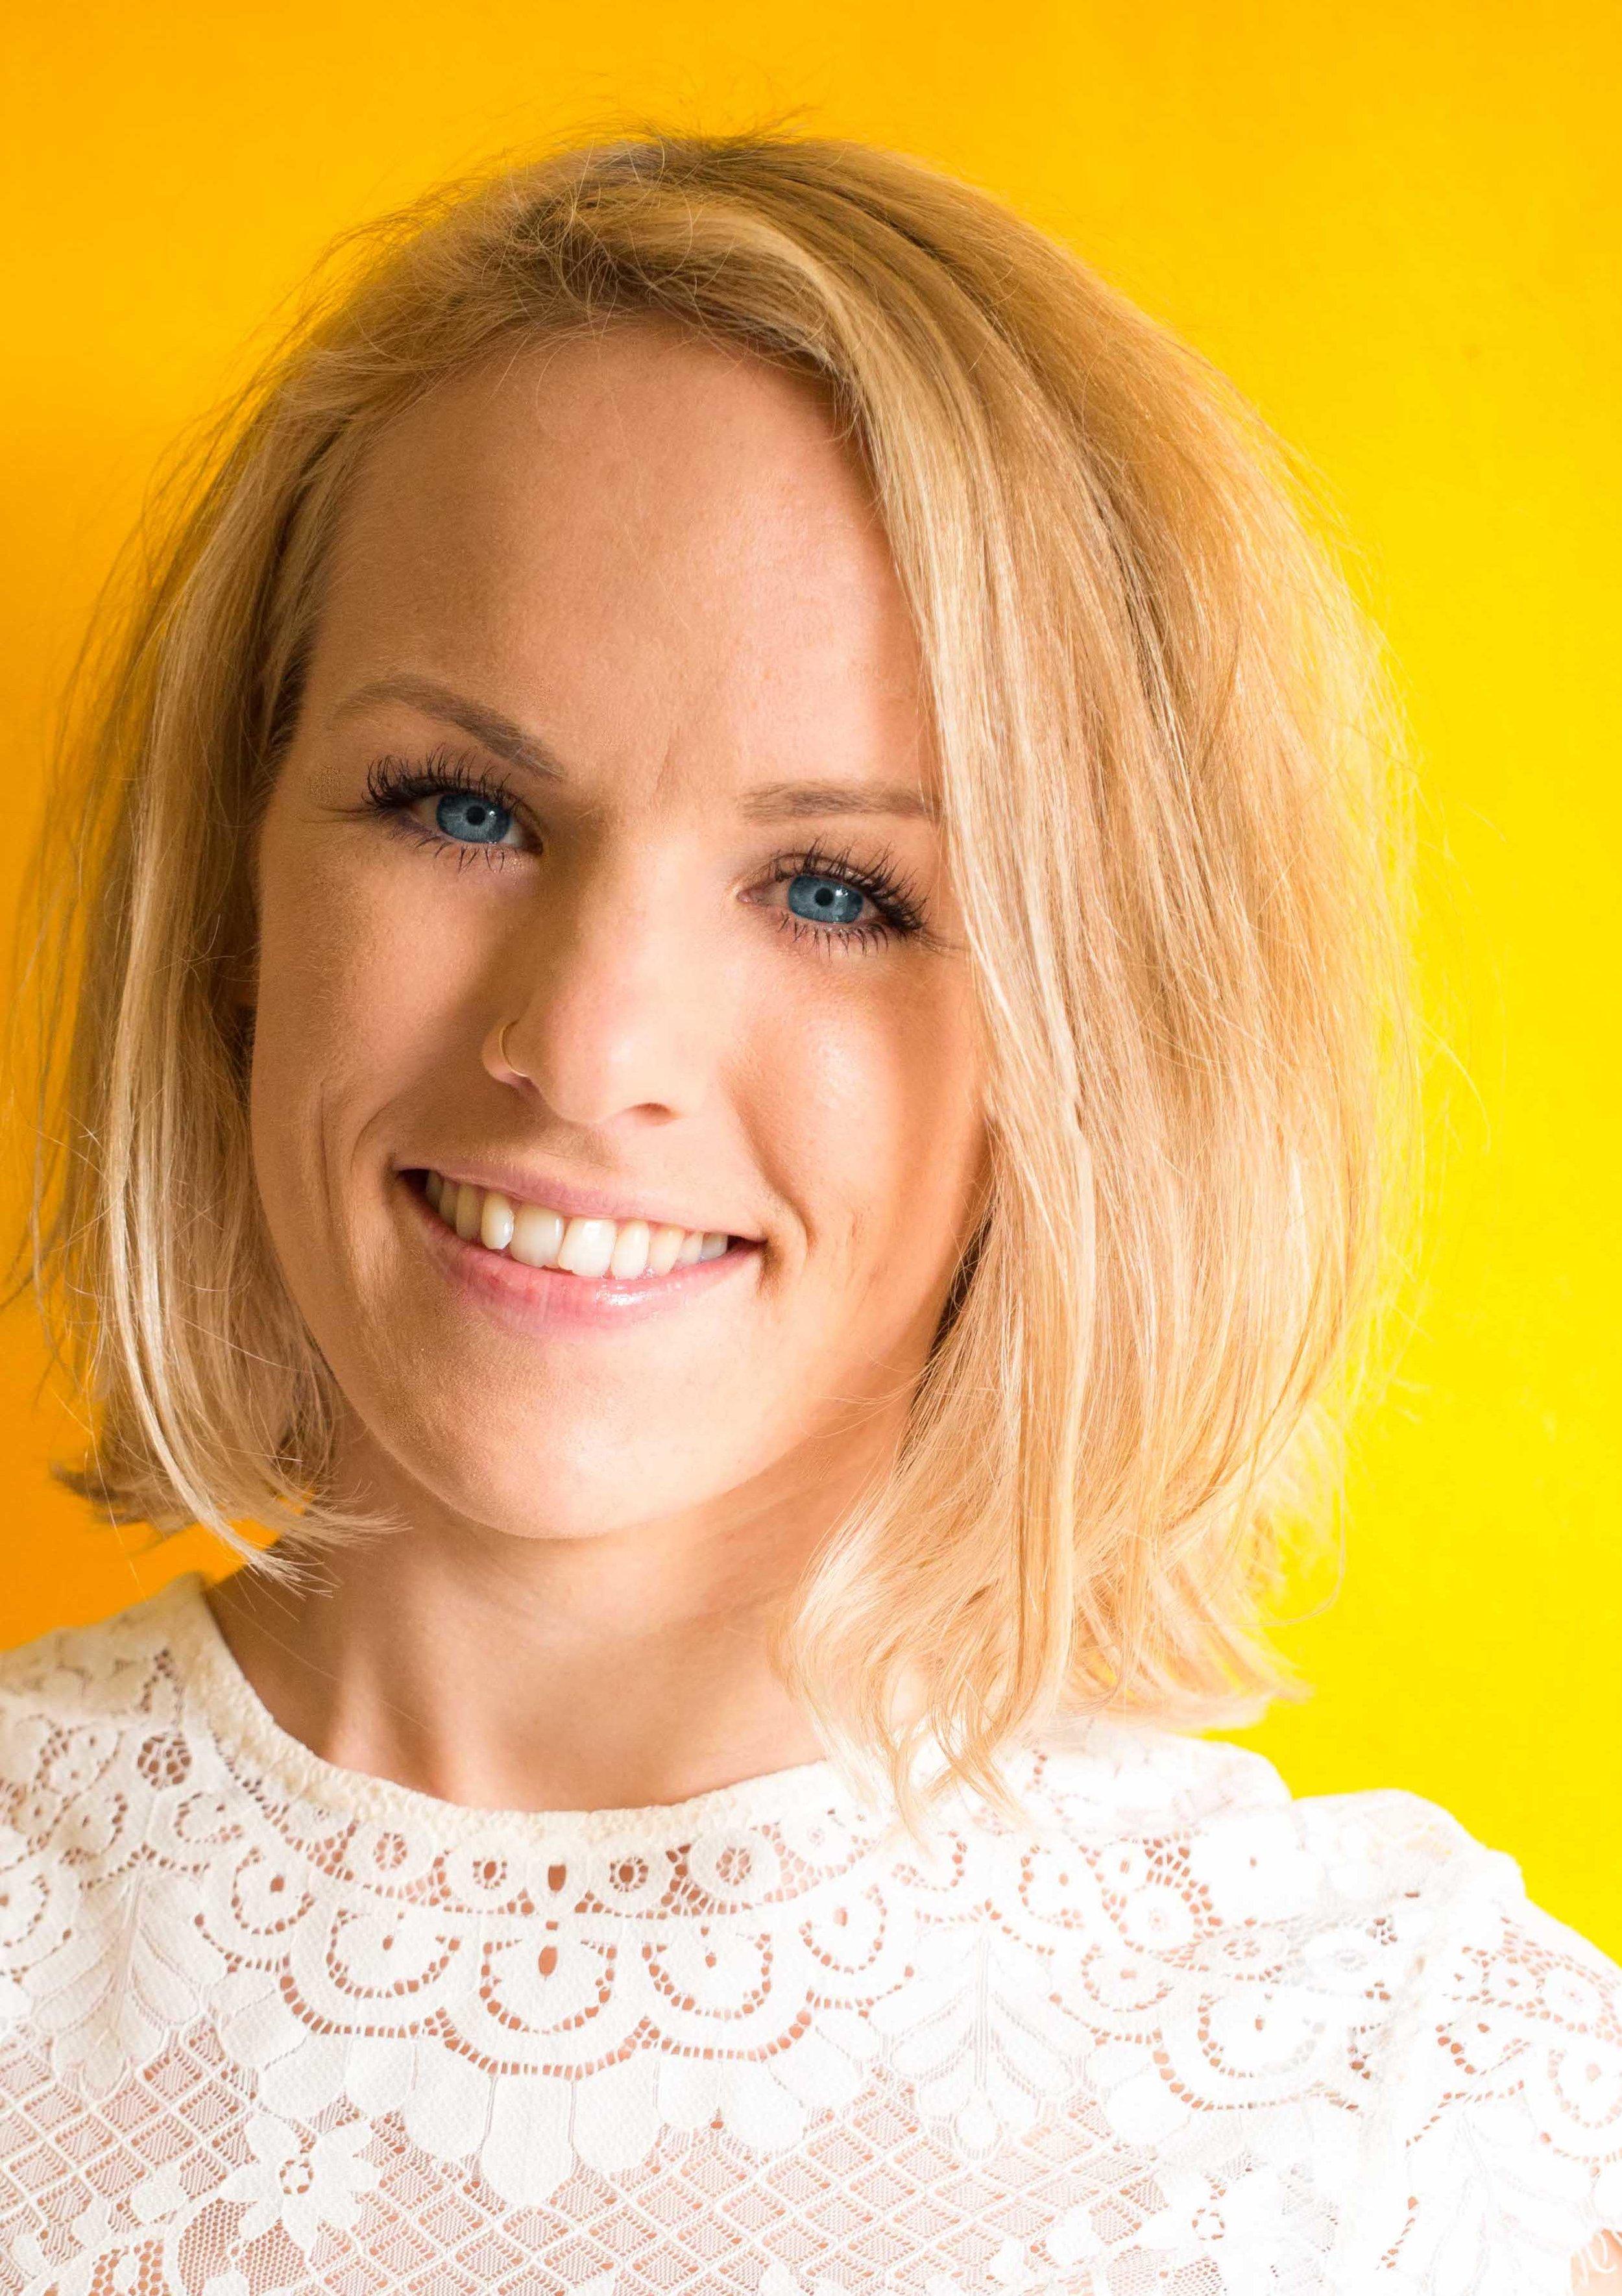 Emily Mowbray - Voice, Piano & Performing Arts | BA (Hons) Music & MMus Vocal studies & performance